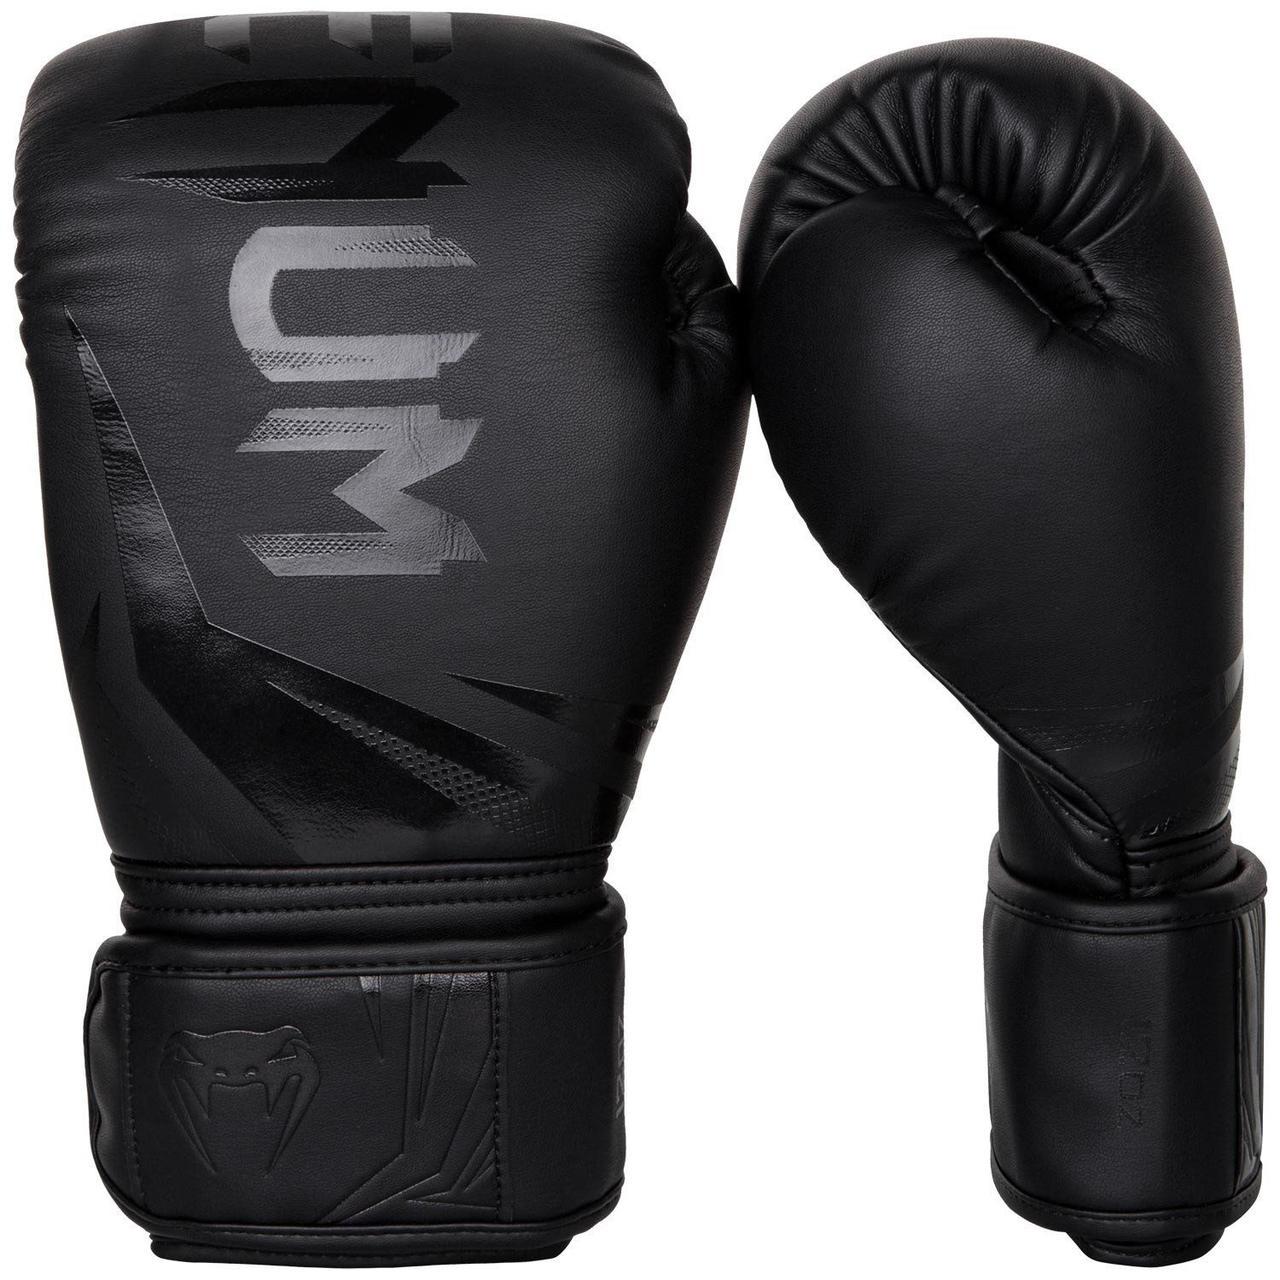 Боксерские перчатки Venum Challenger 3.0 Black/Black